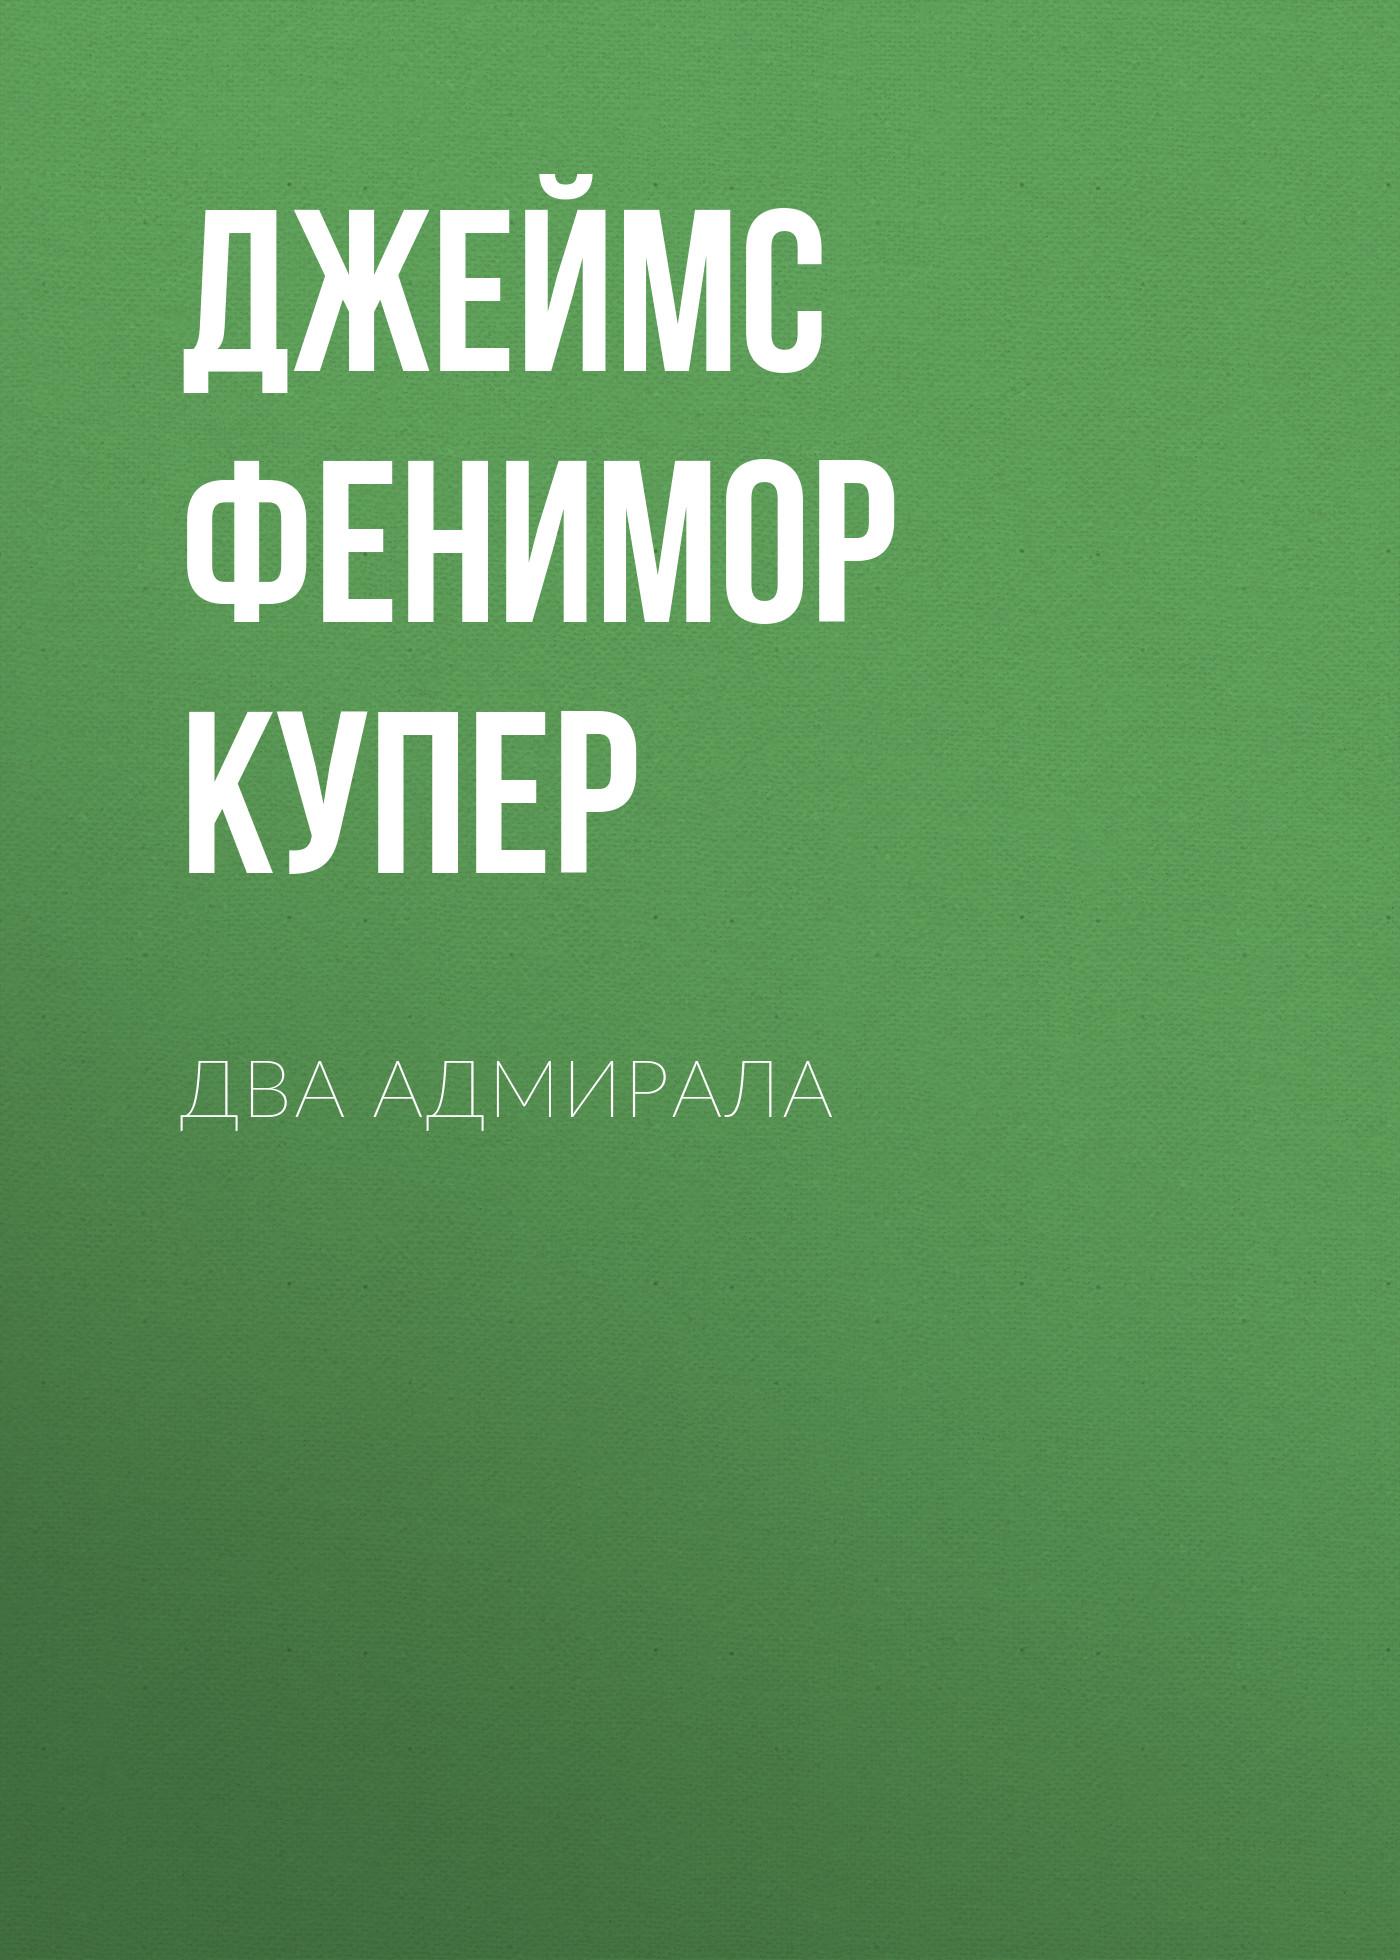 Джеймс Фенимор Купер Два адмирала